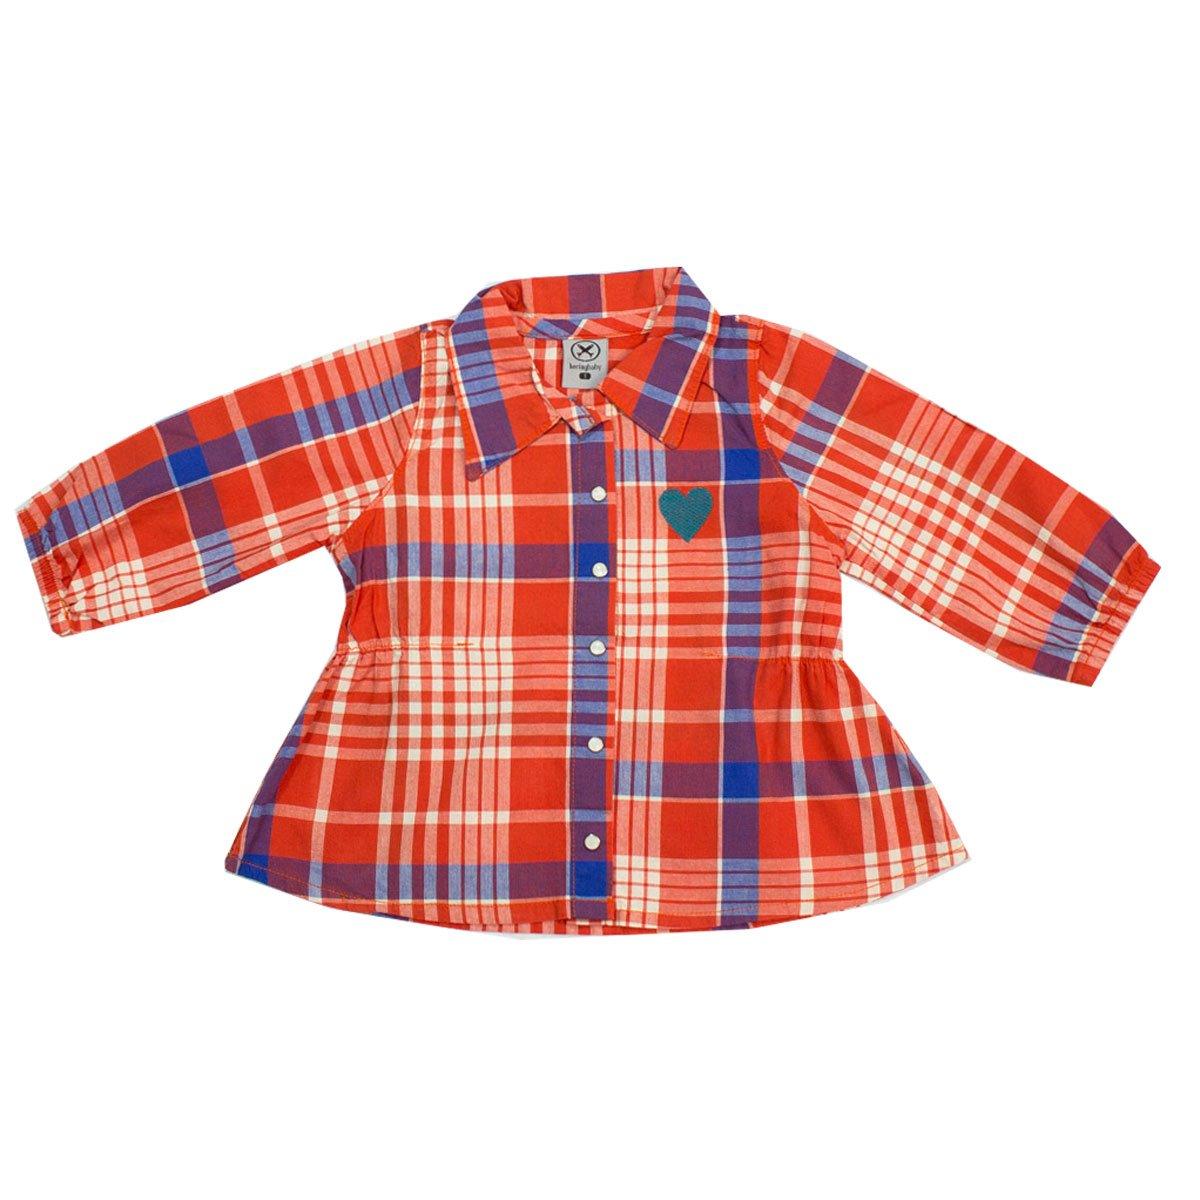 7be48d96b7 Bizz Store - Camisa Xadrez Infantil Bebê Menina Hering Kids